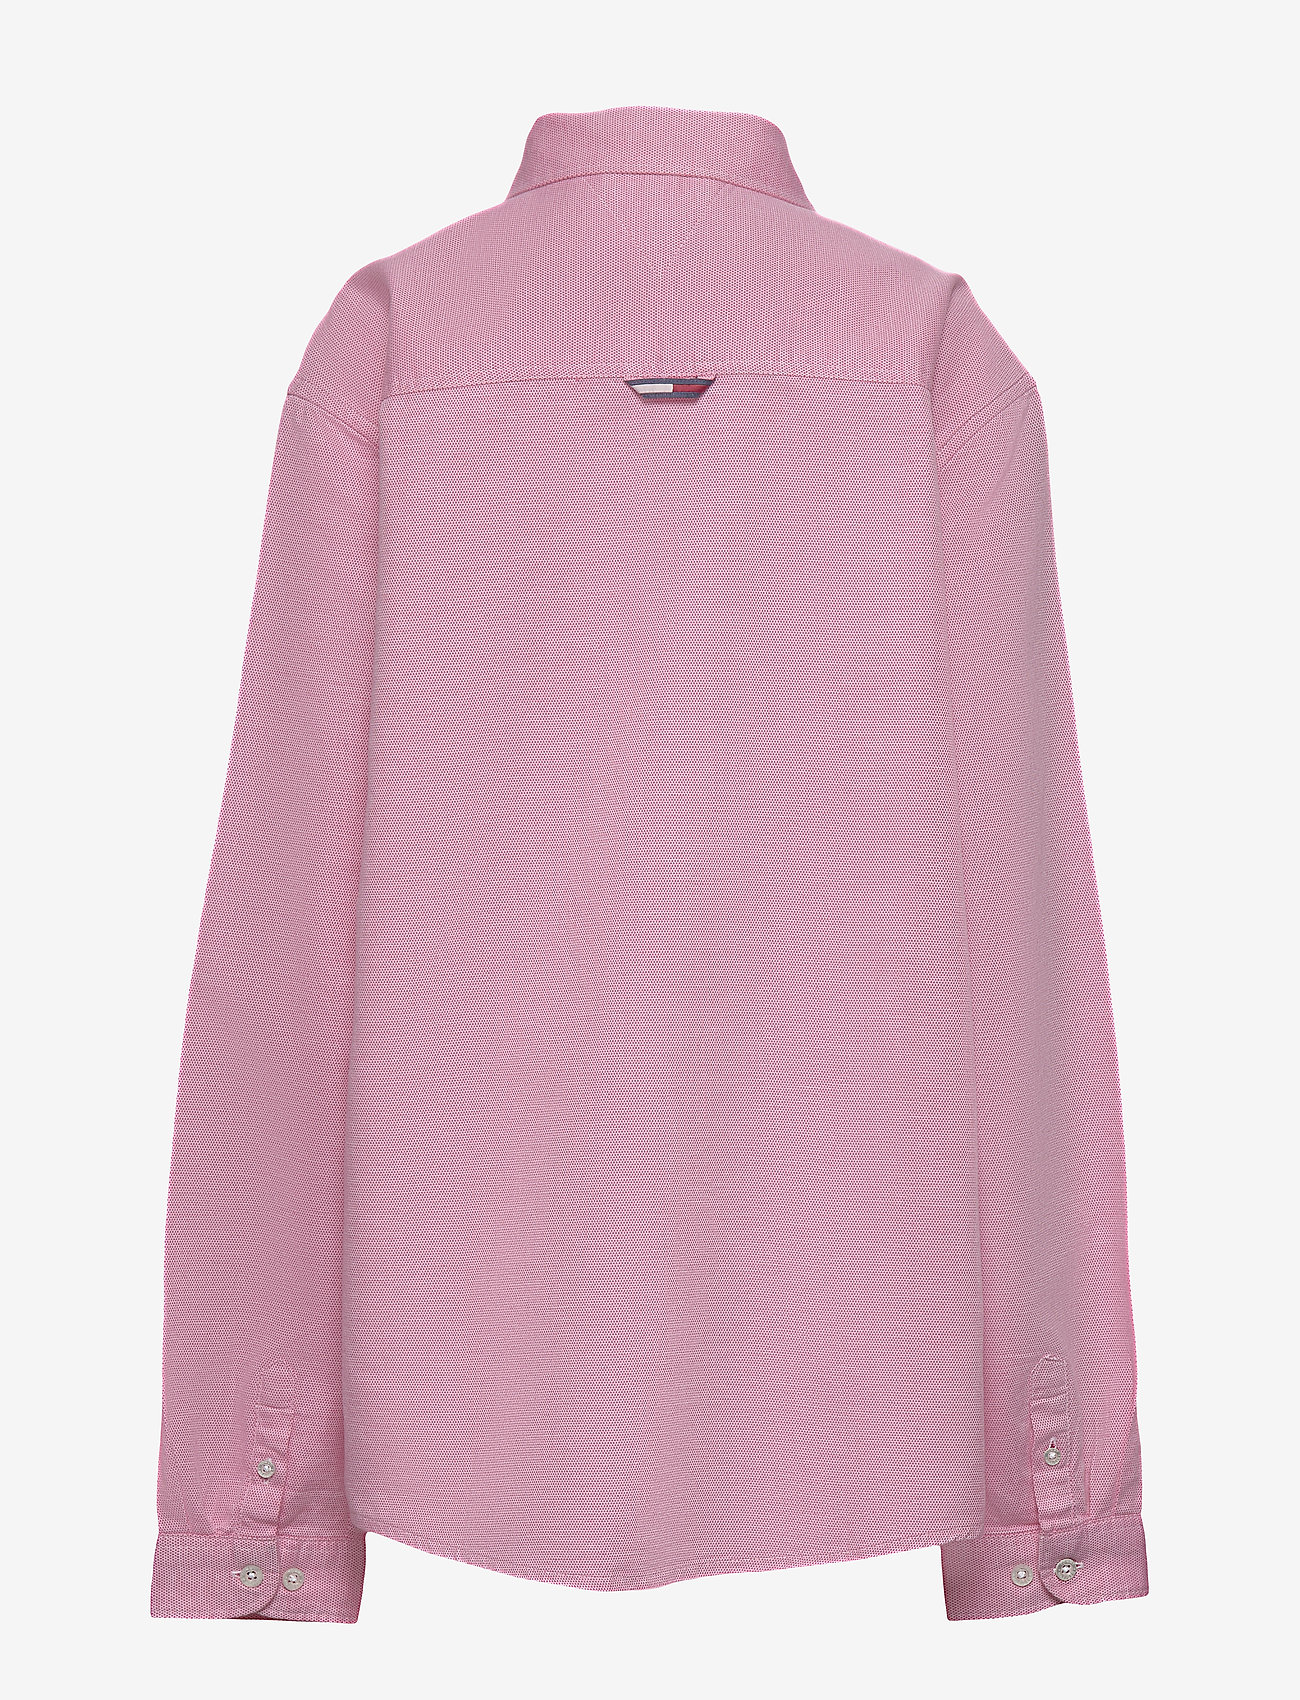 Tommy Hilfiger - STRUCTURED LINEN SHI - shirts - light cerise pink - 1